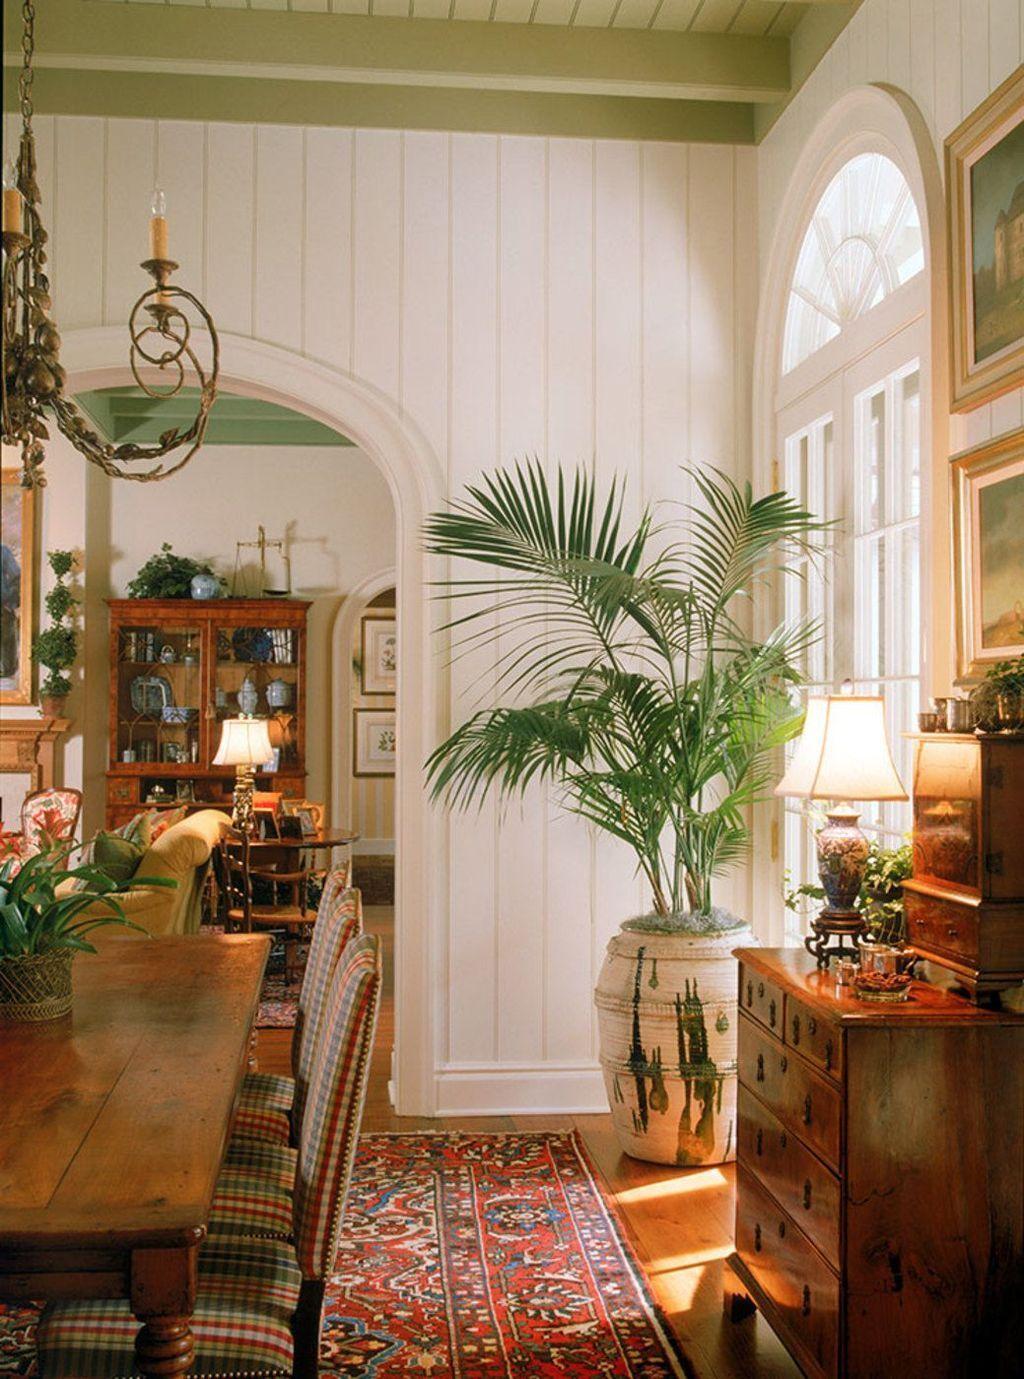 32 Inspiring West Indies Decor Ideas In 2020 British Colonial Decor Colonial Dining Room Dining Room Decor Traditional